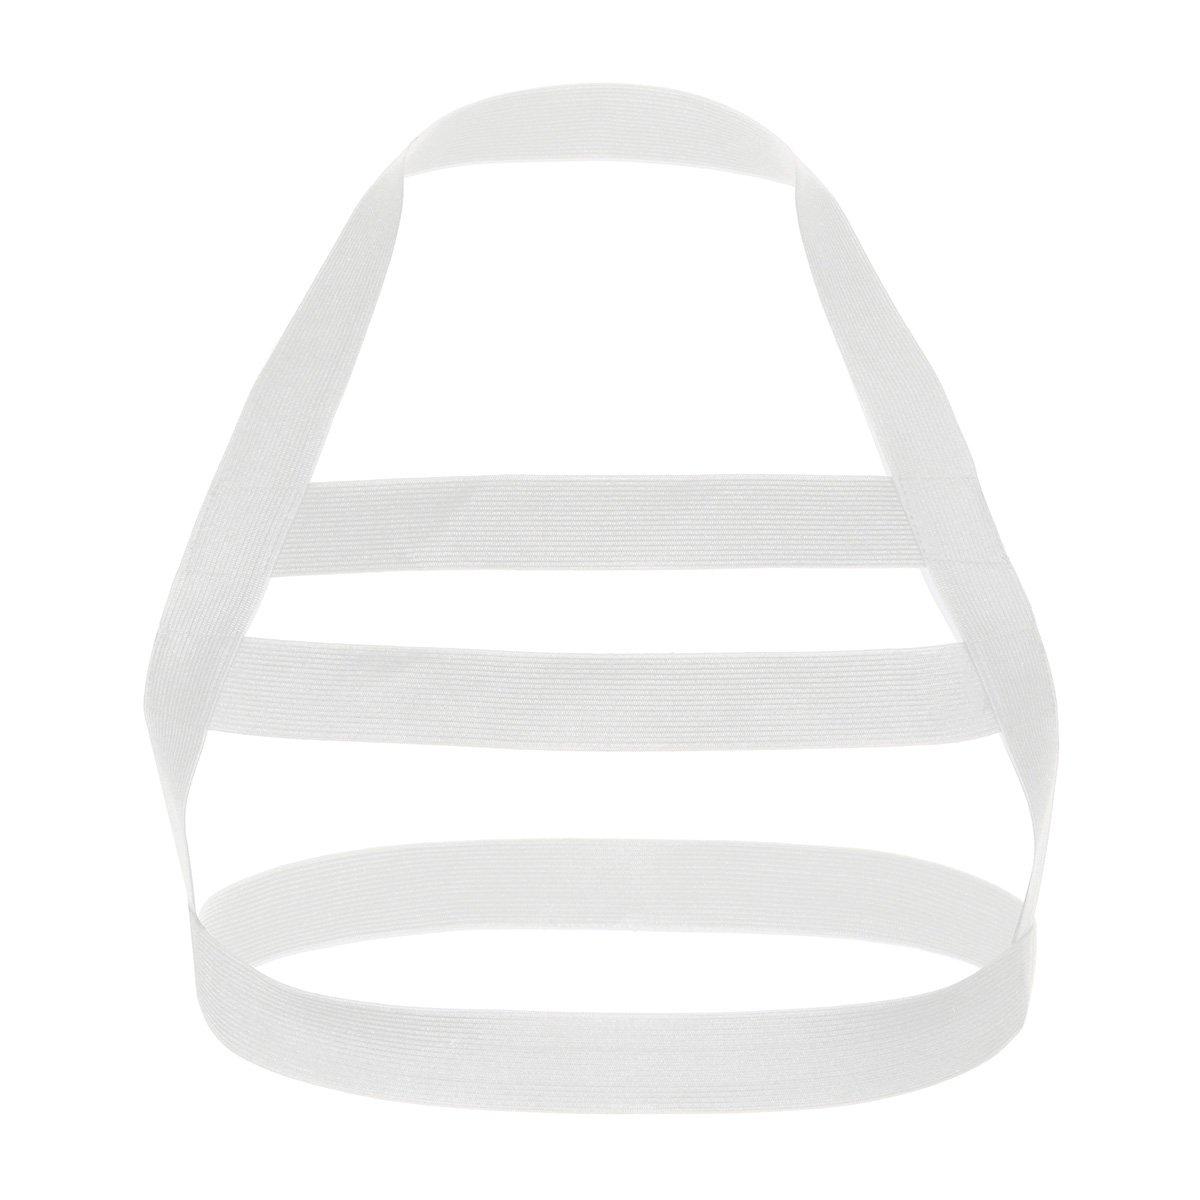 iEFiEL Men Nylon Halter Neck Elastic Body Chest Harness Costume Belt White One Size